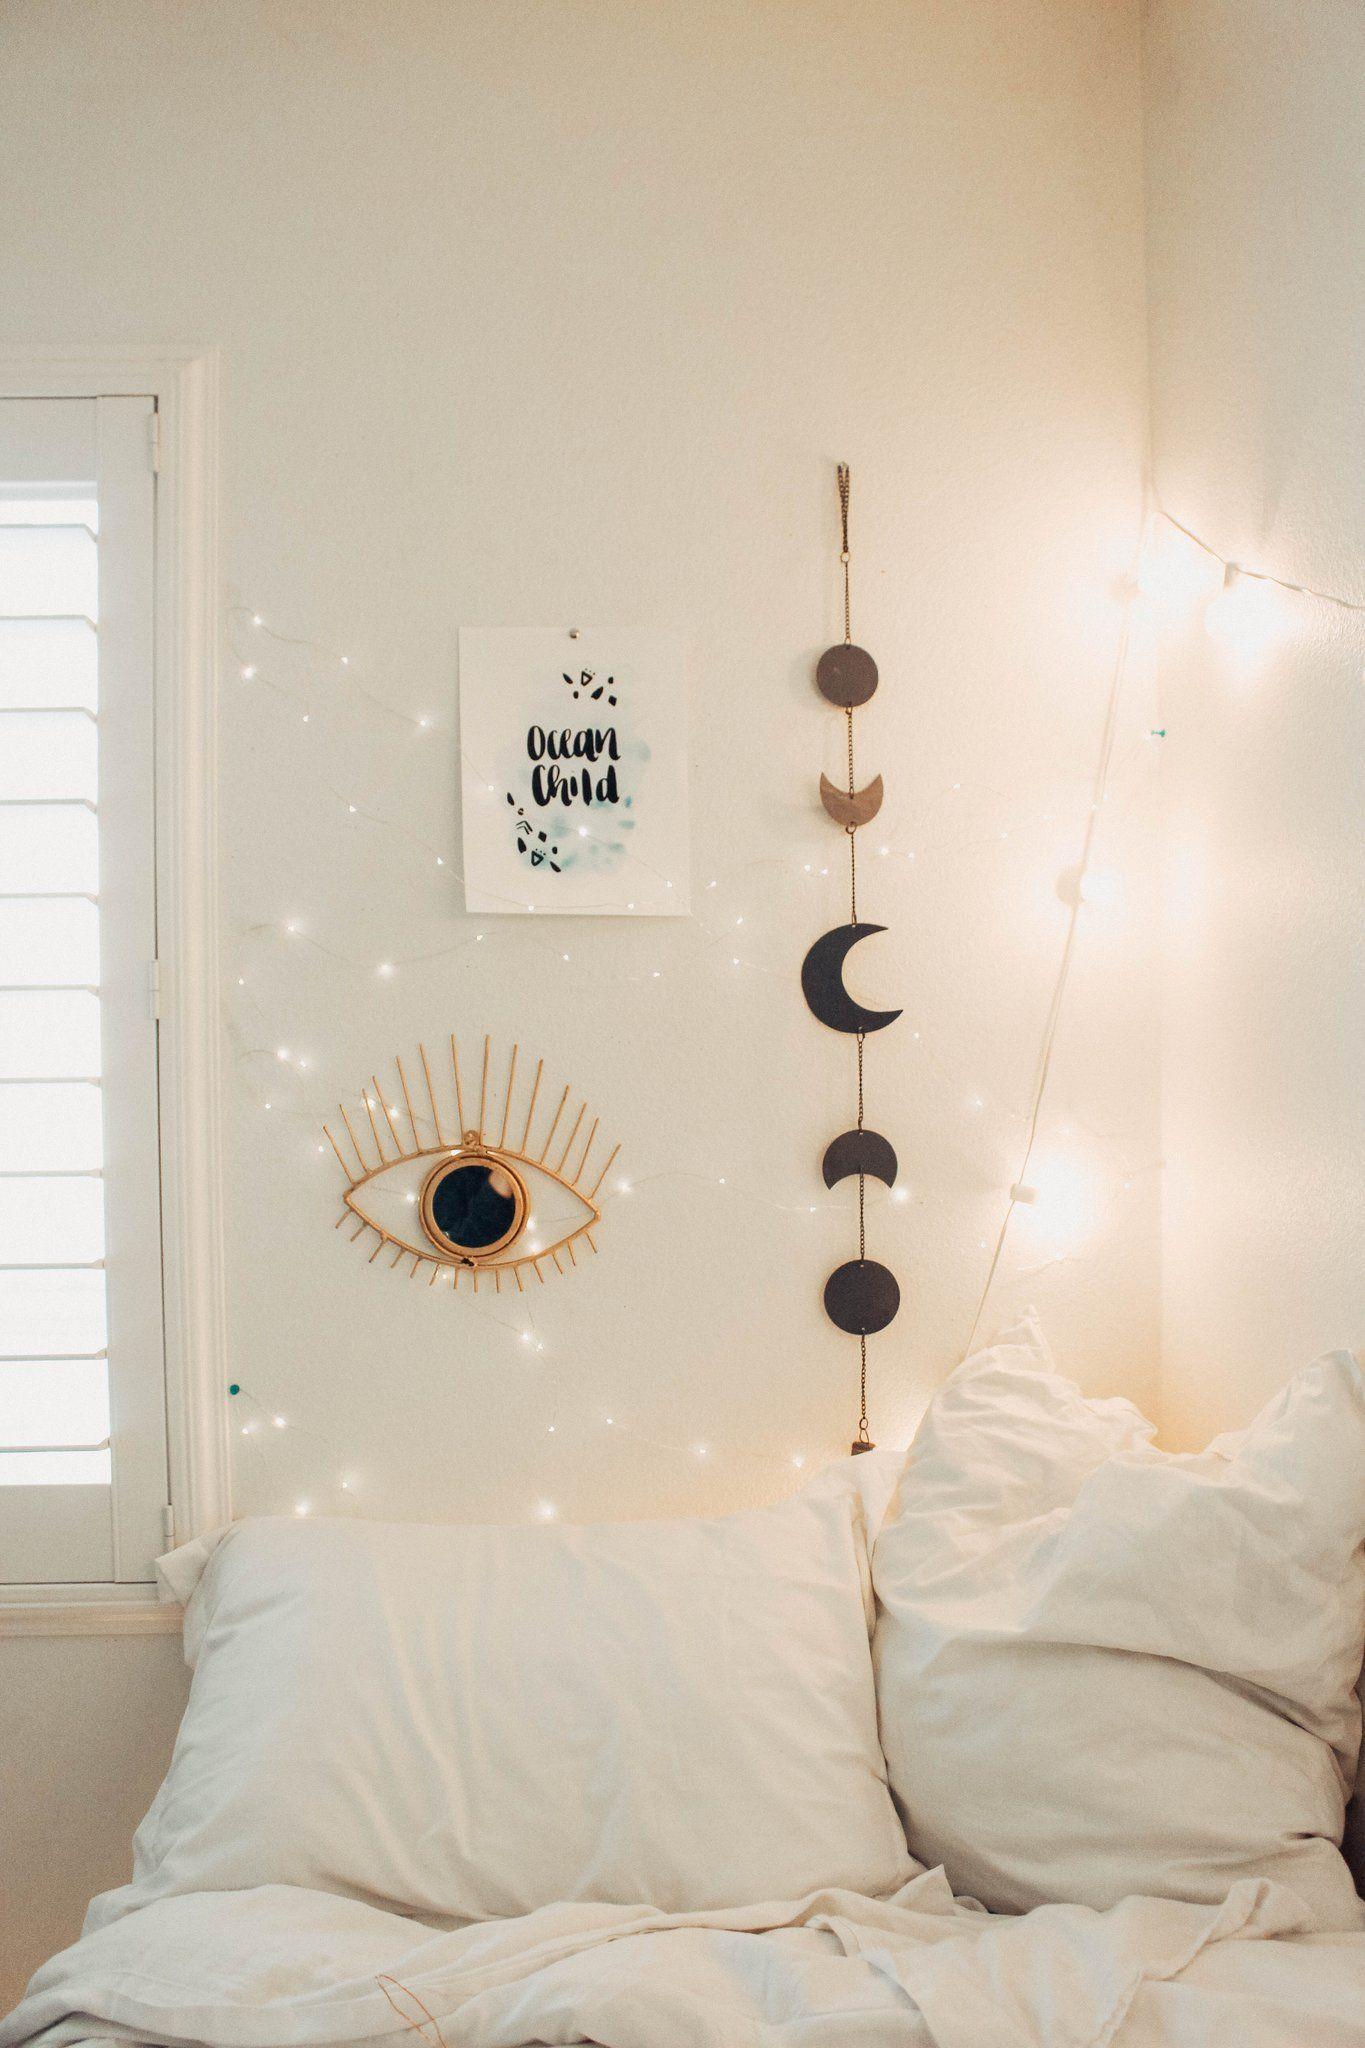 Moon Phases Wall Hanging Decor Wall Decor Bedroom Room